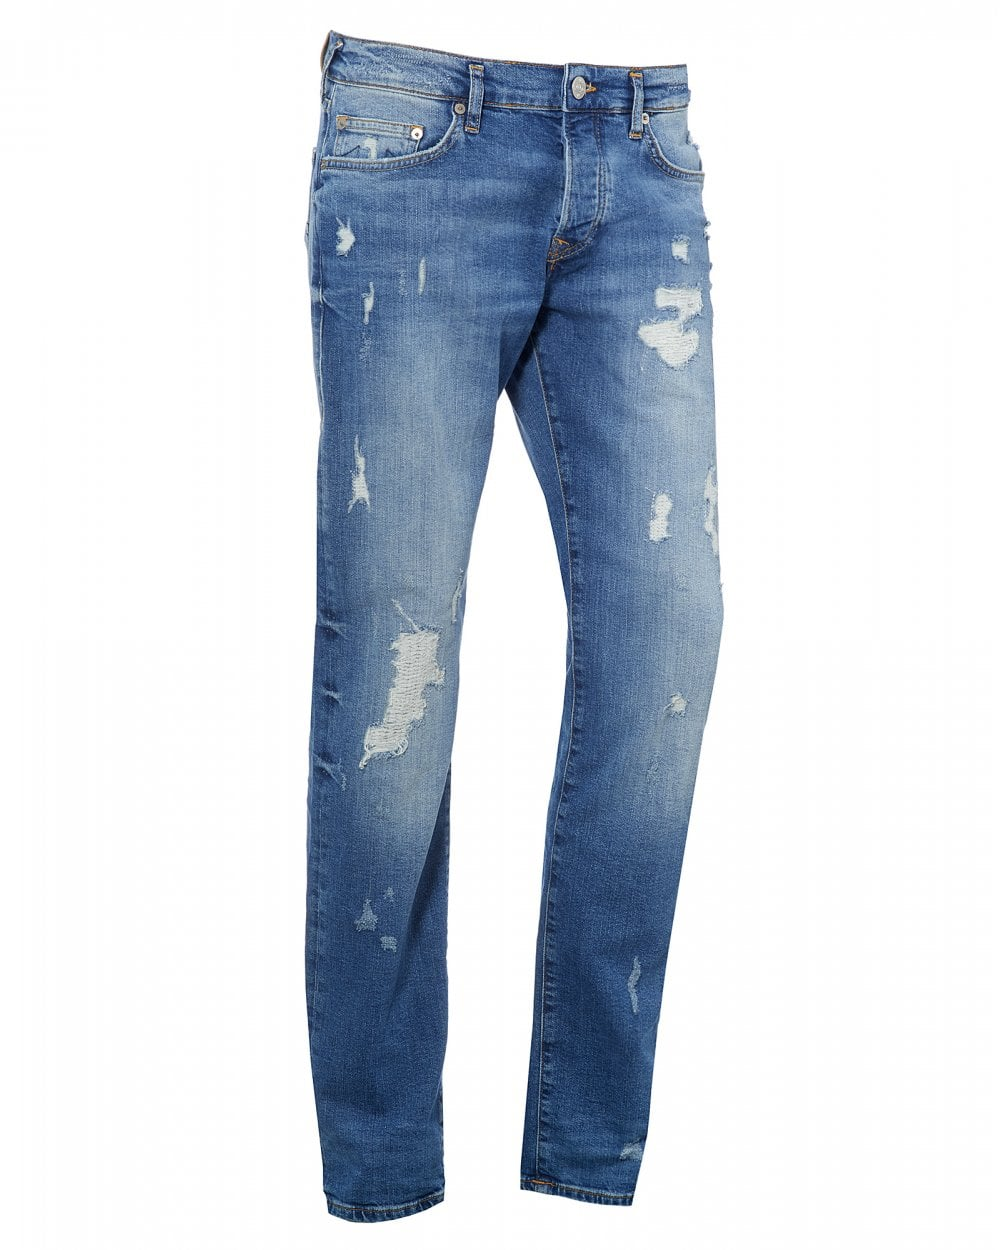 19e6c148d2a True Religion Mens Rocco Destroyed Jeans